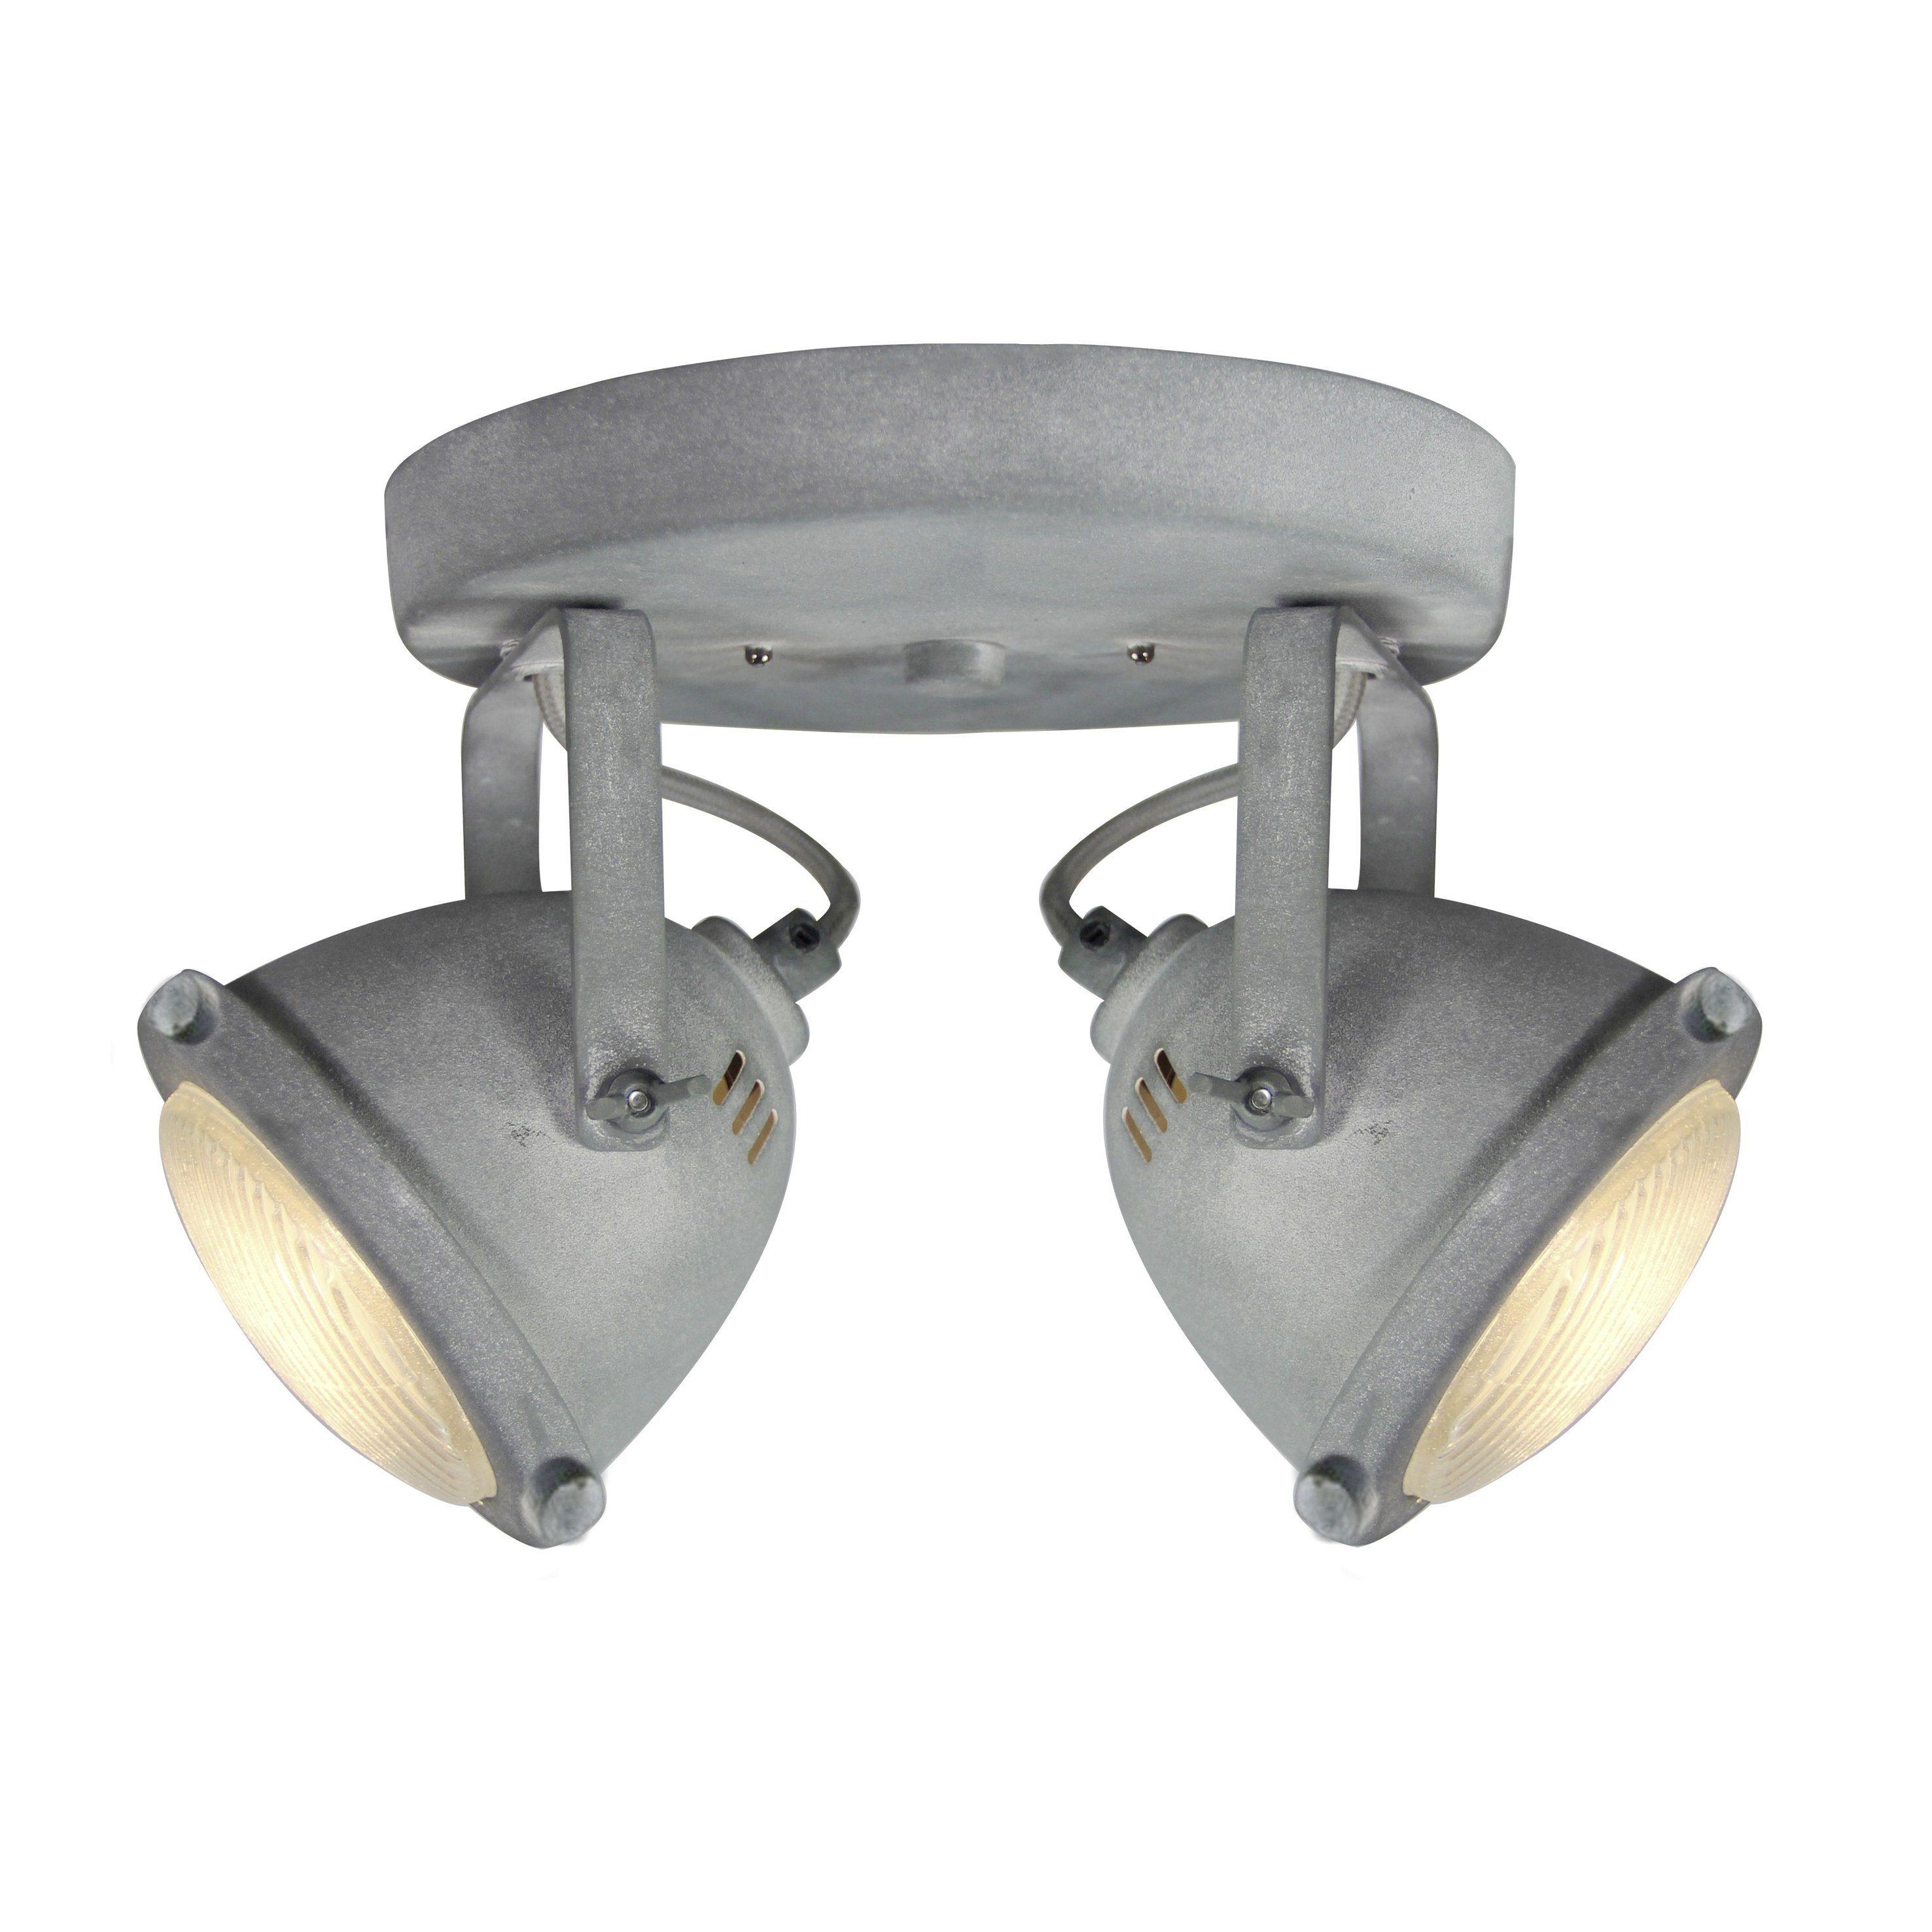 Brilliant Leuchten Carmen LED Spotrondell, 2-flammig grau Beton